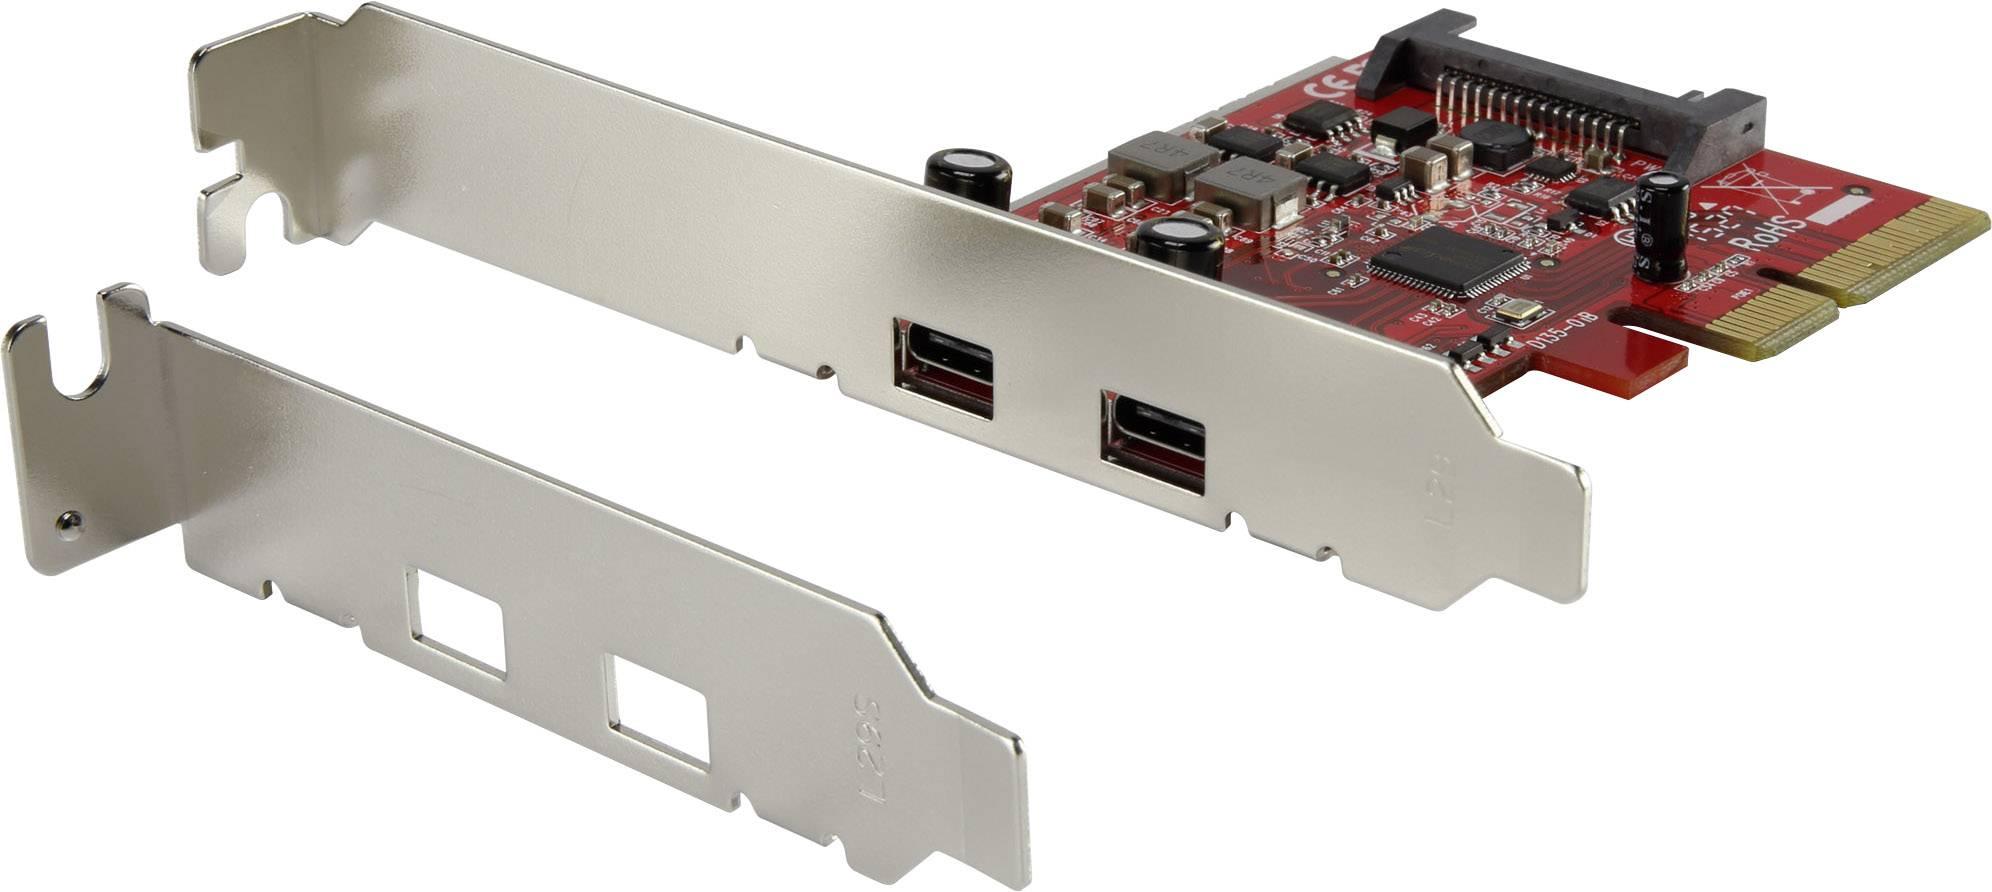 PCIe karta pre 2 USB 3.1 porty RENKFORCE